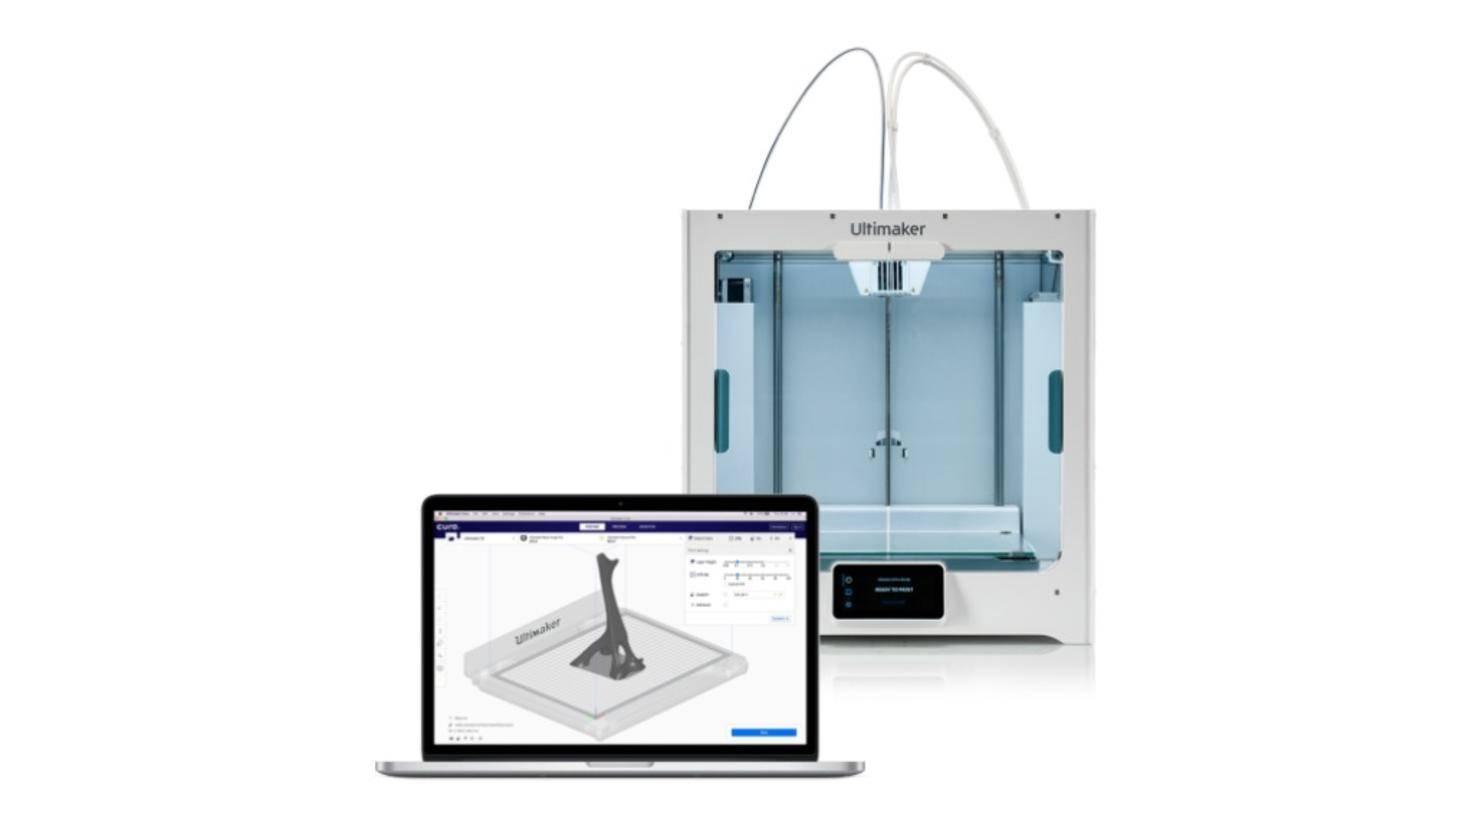 ultimaker-cura-3d-printer-software